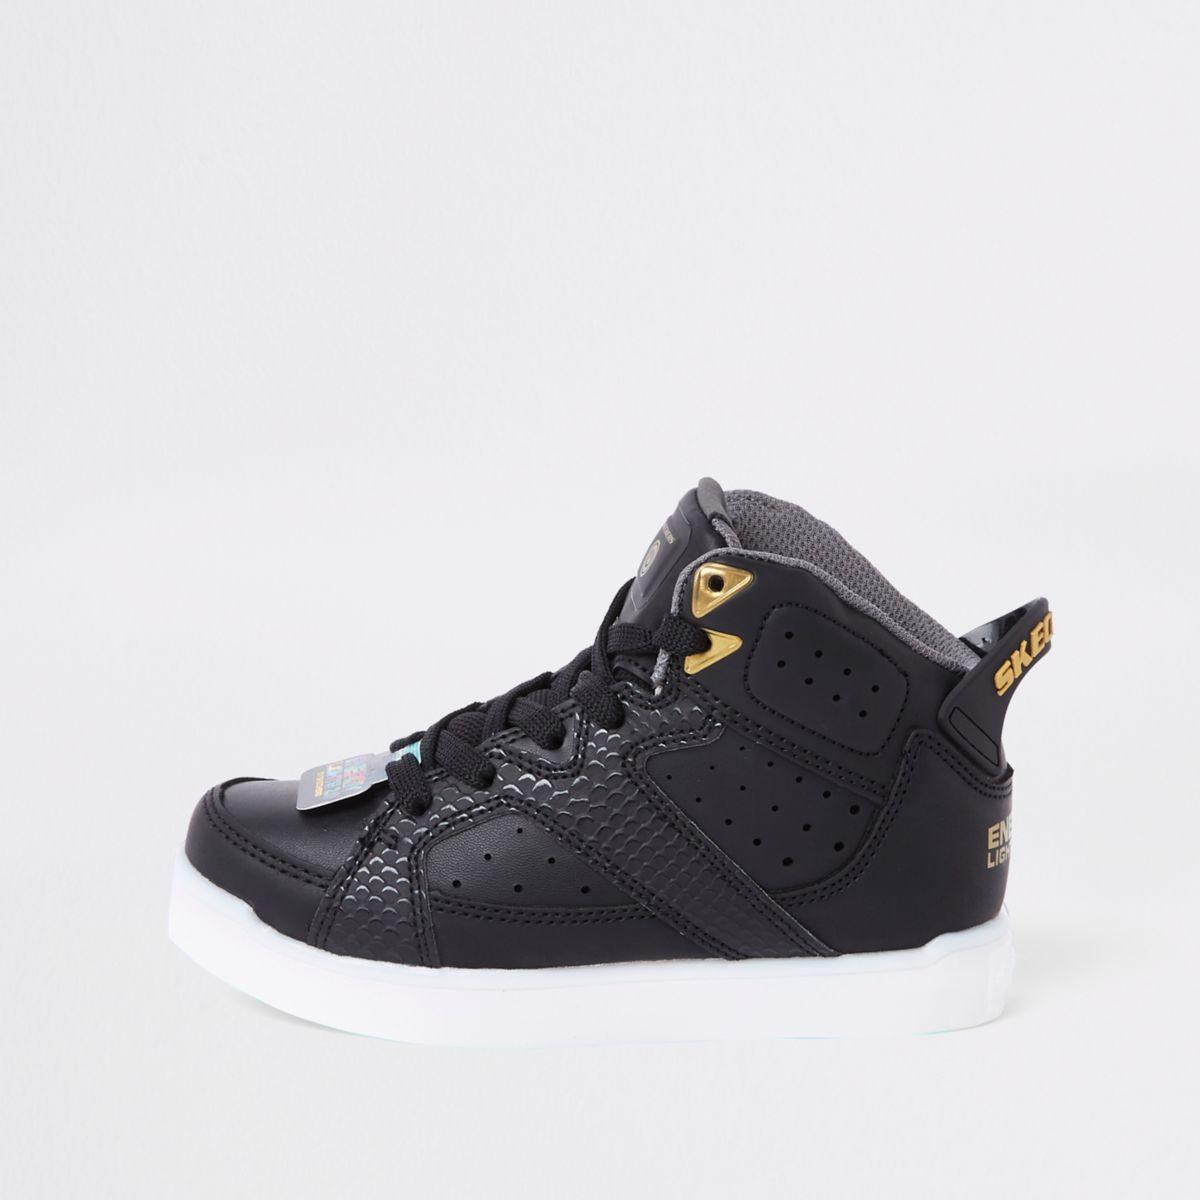 Black Skechers black light up trainers